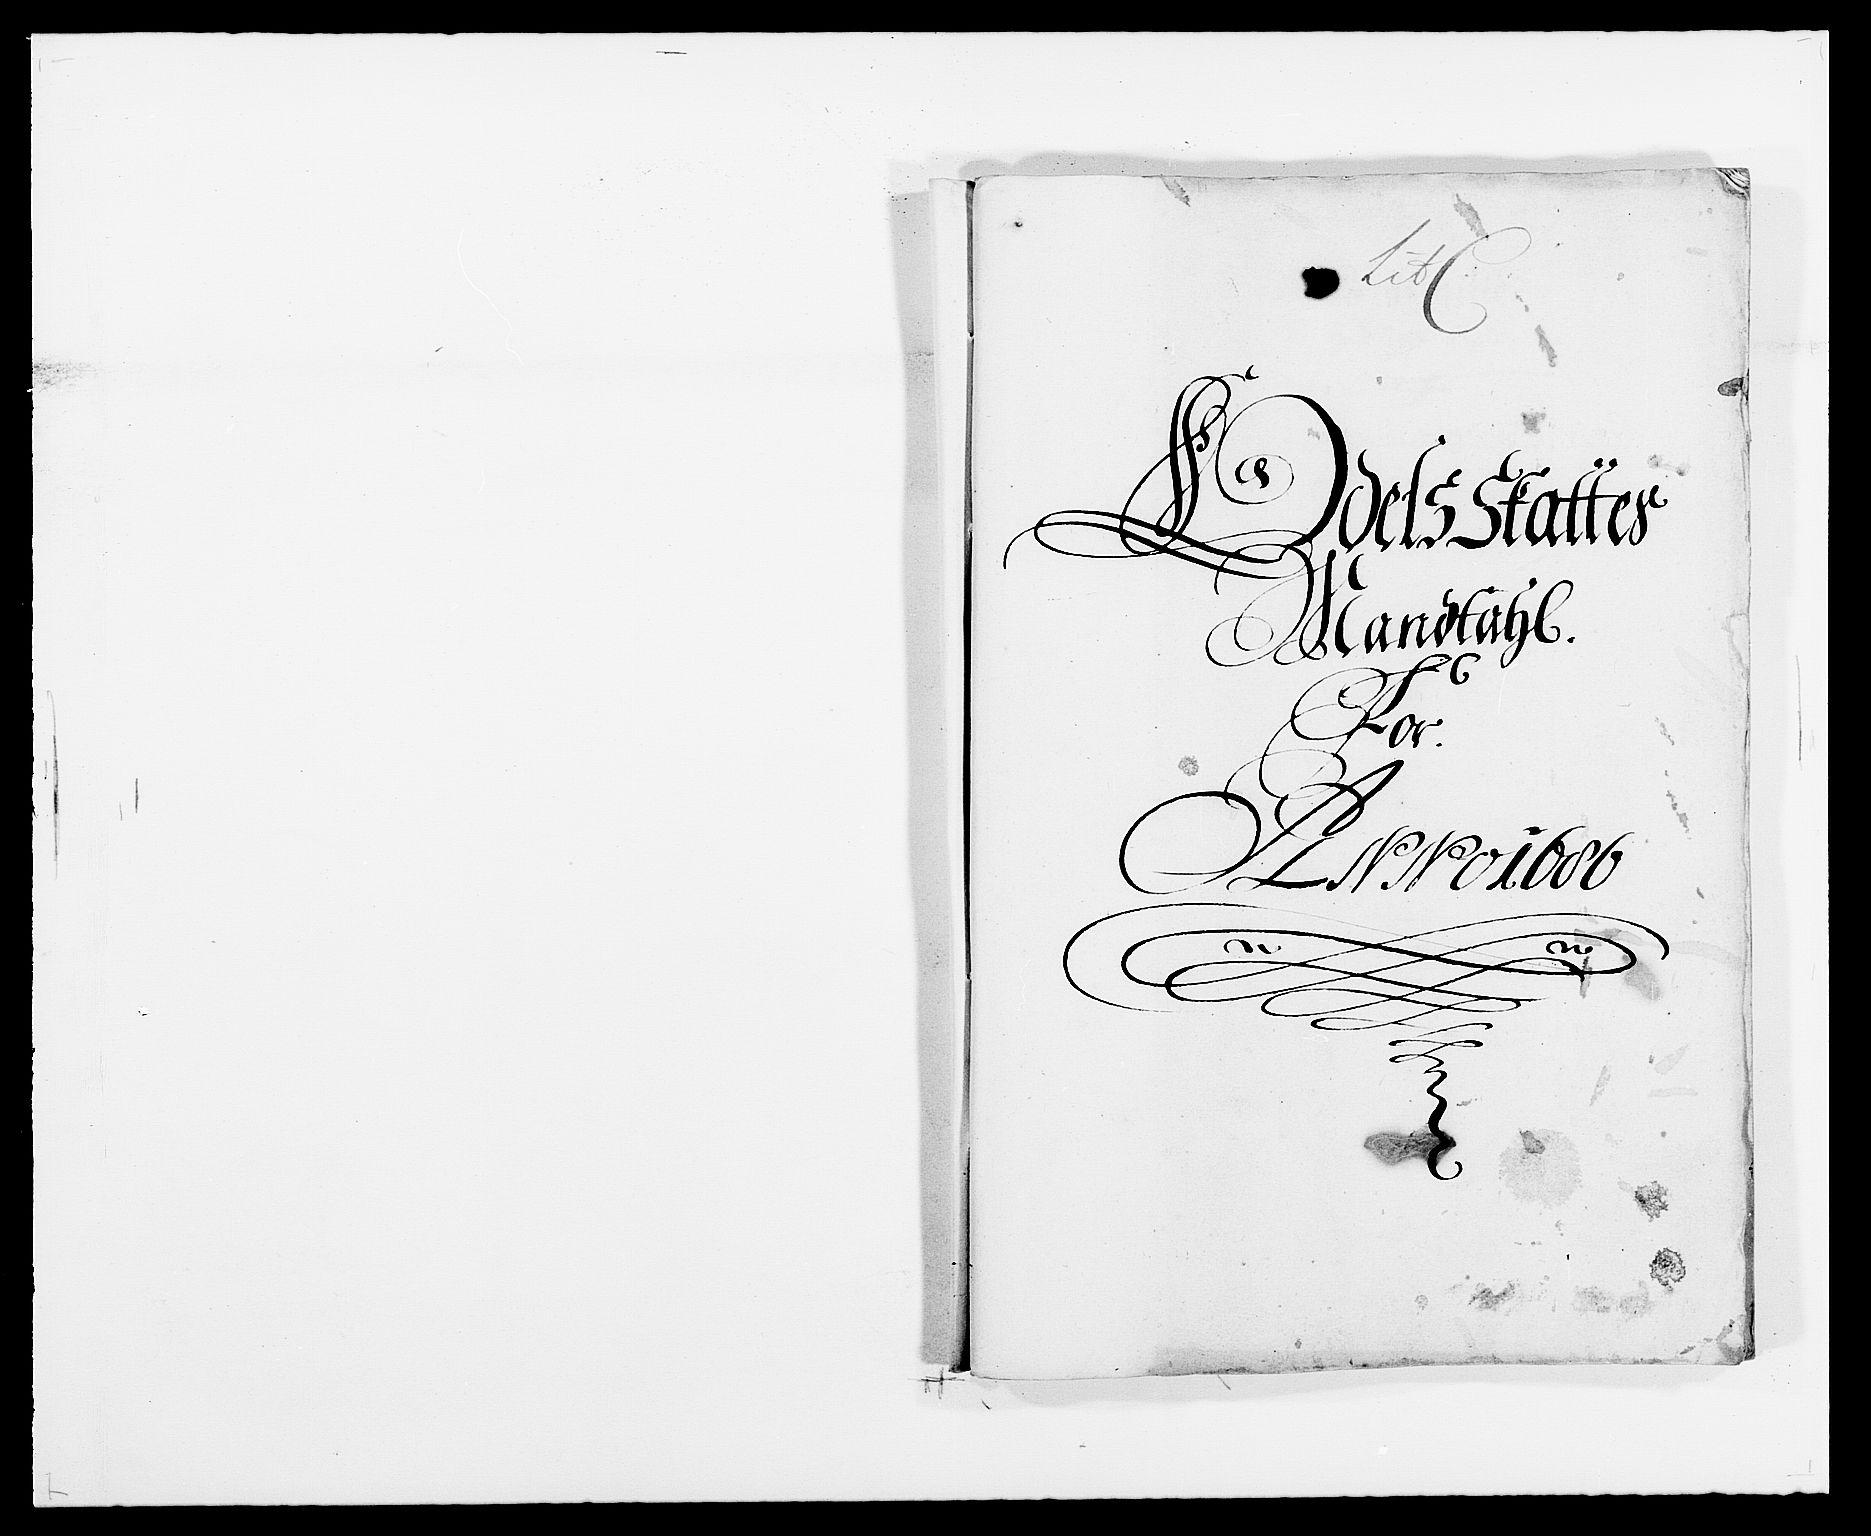 RA, Rentekammeret inntil 1814, Reviderte regnskaper, Fogderegnskap, R32/L1857: Fogderegnskap Jarlsberg grevskap, 1686-1690, s. 189